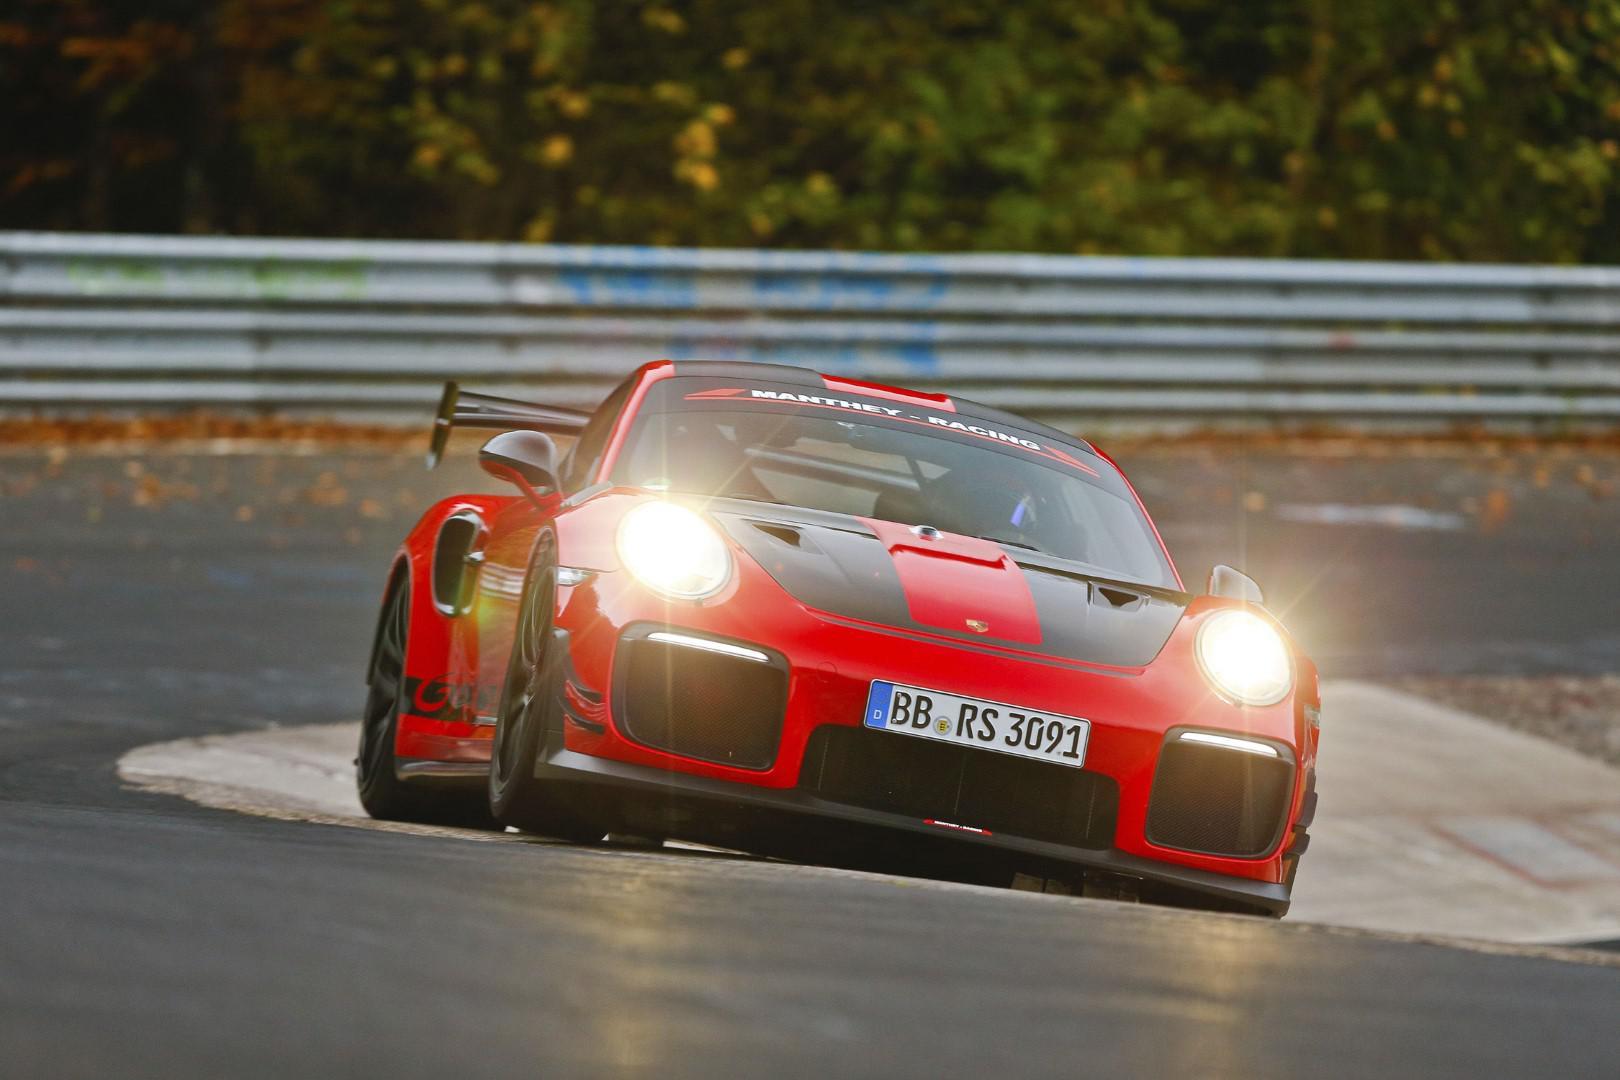 video-porsche-911-gt2-rs-mr-la-nouvelle-reine-du-ring-du-nuerburgring-907-1.jpg